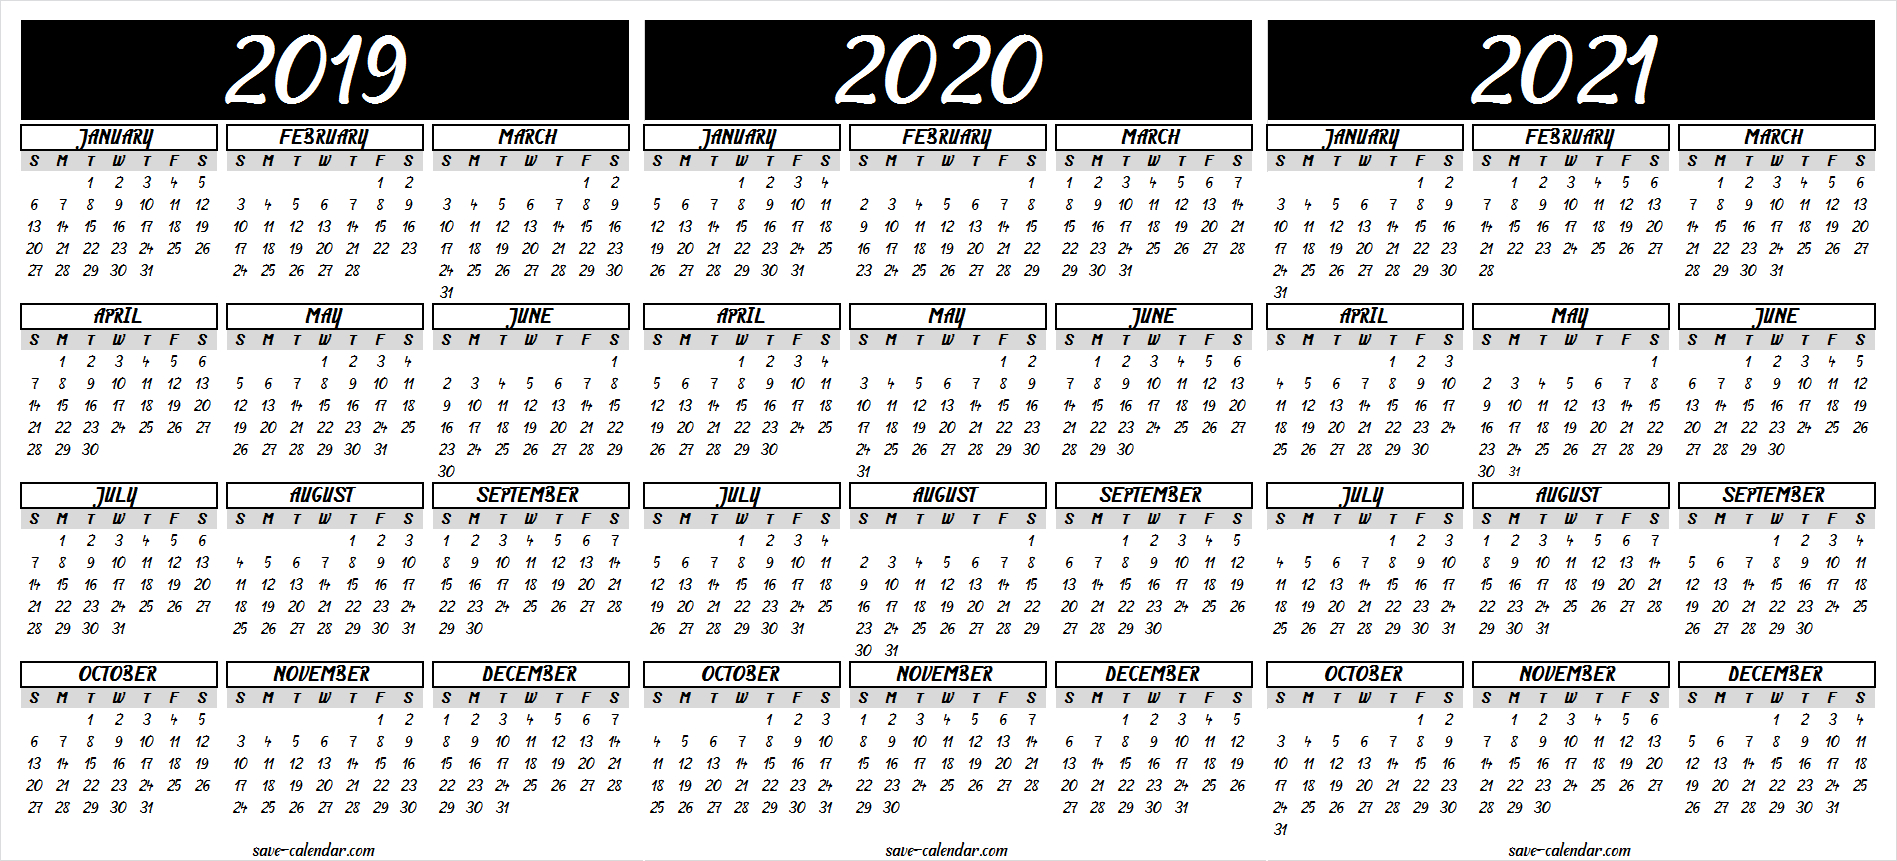 2019 2020 2021 Calendar Printable | 2021 Calendar, Free inside 2 Year Calendar Template 2020 2021